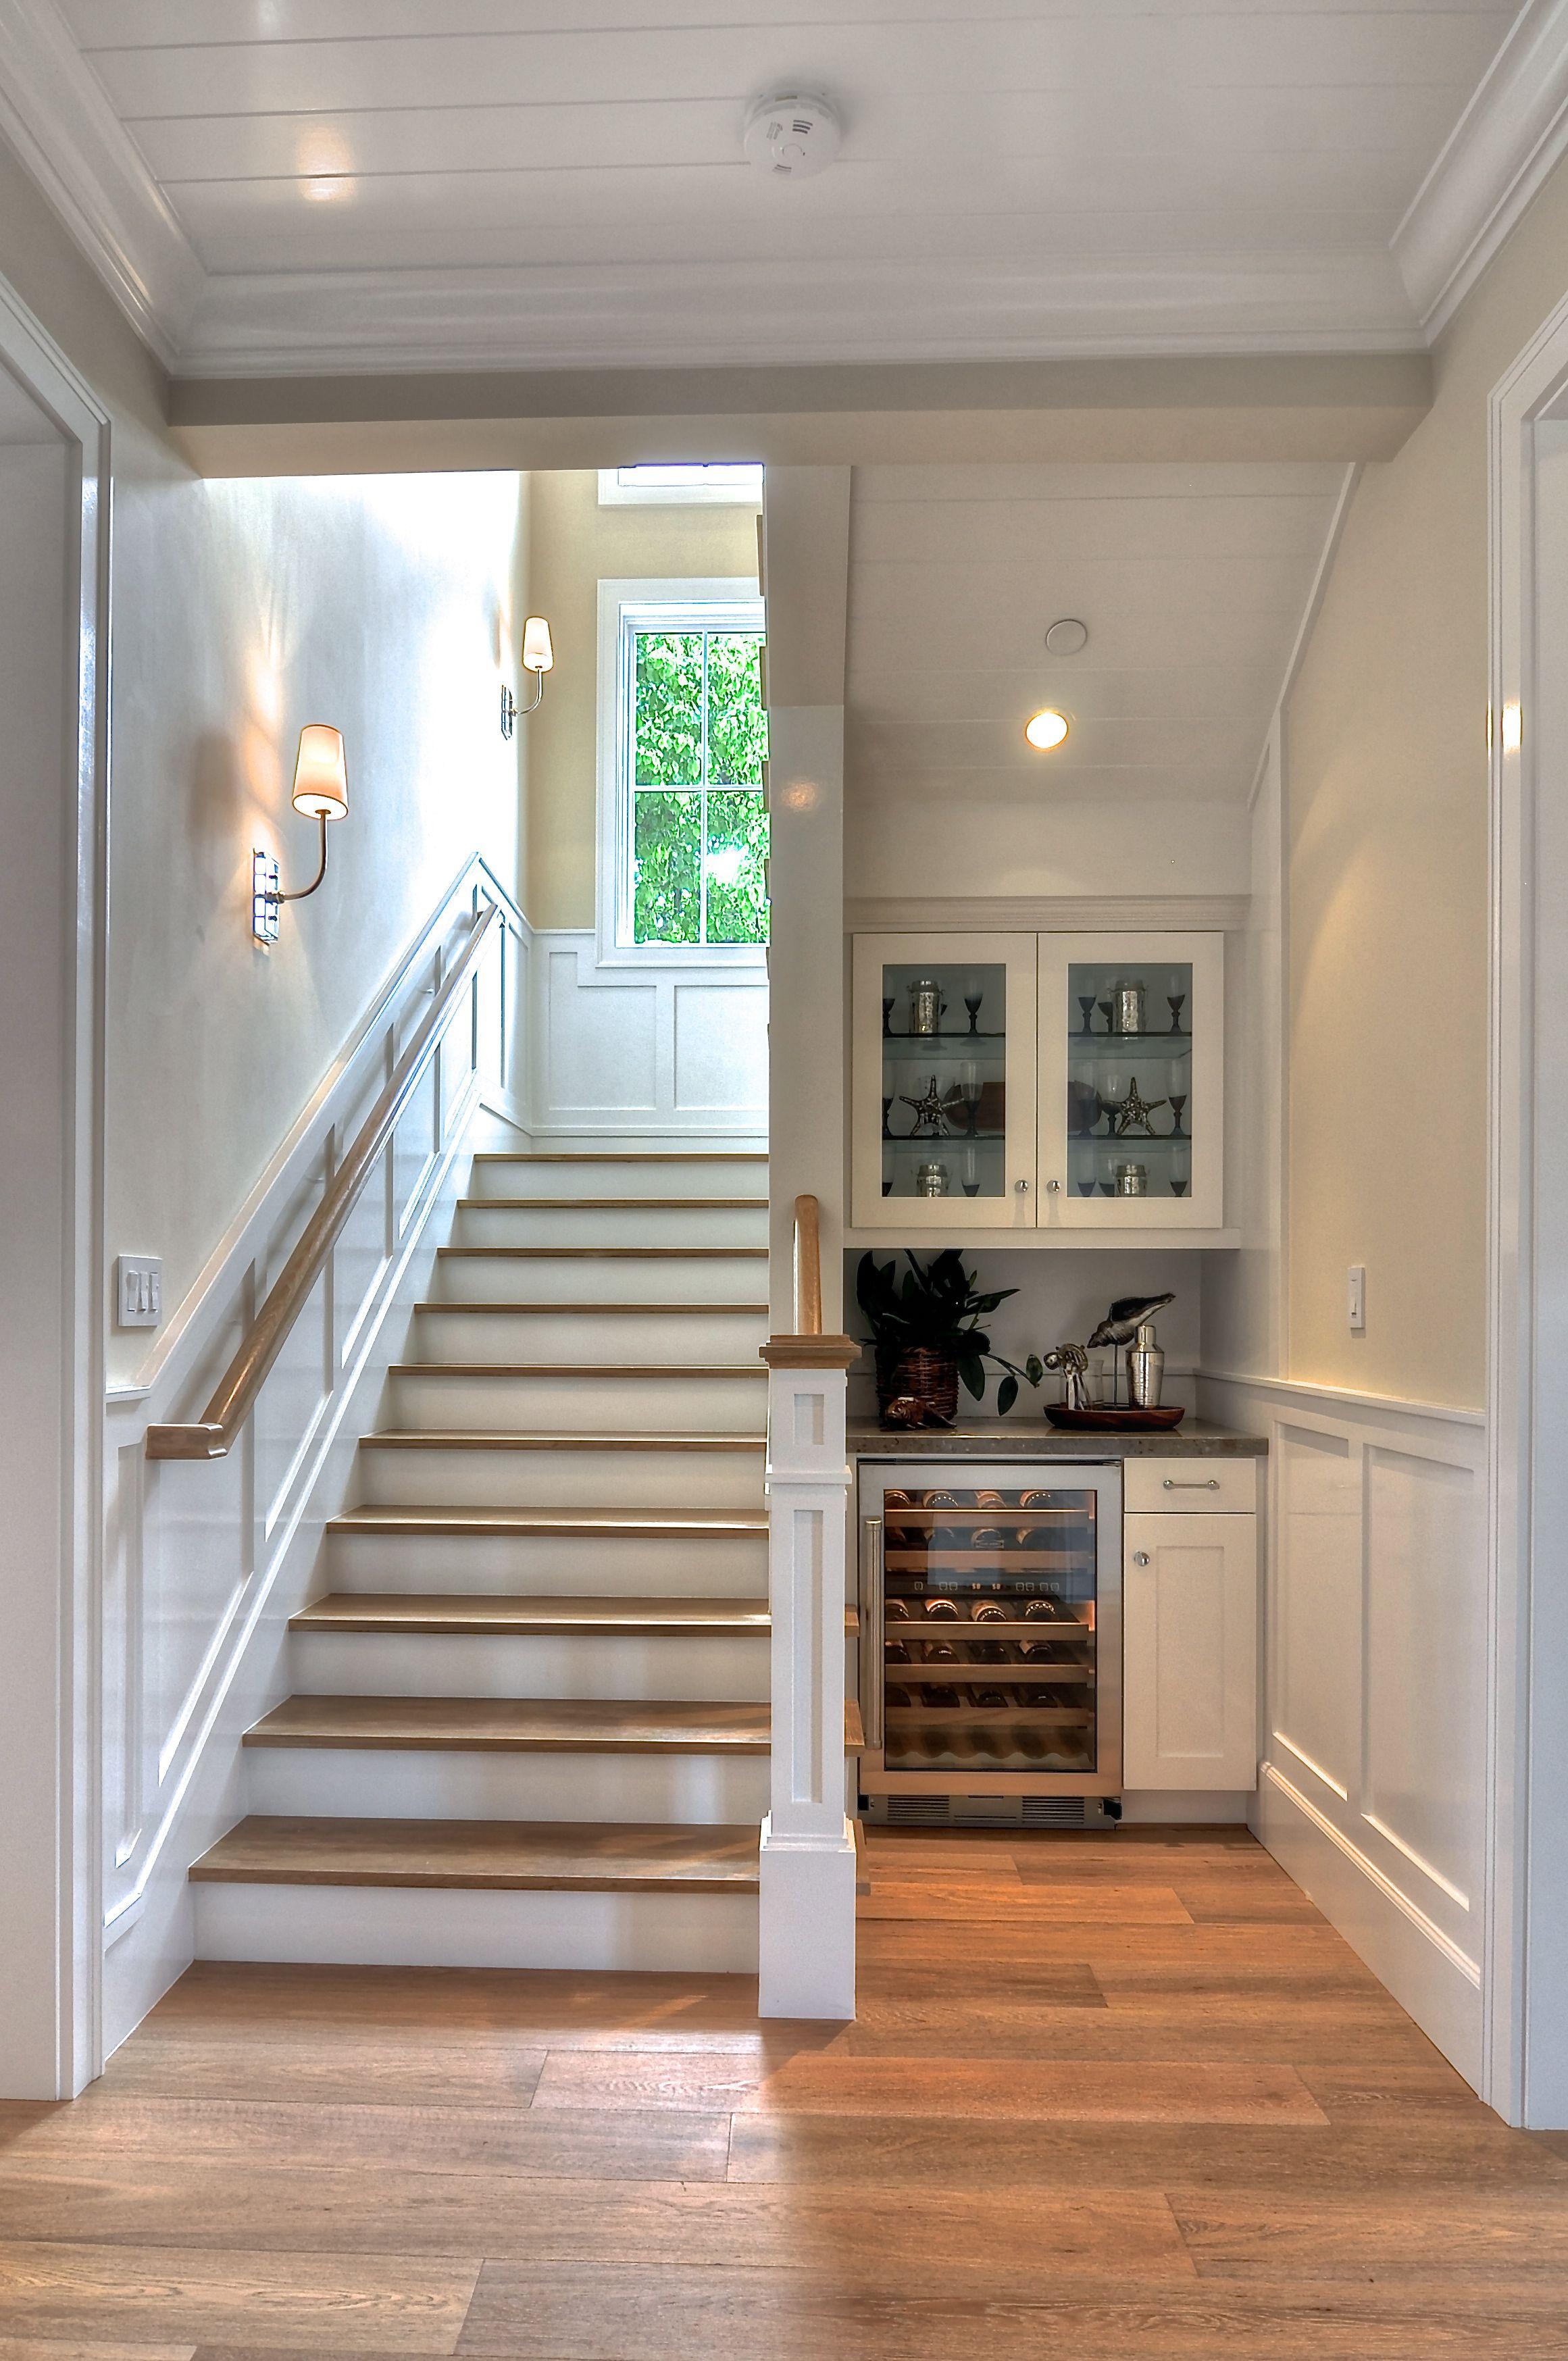 Lighting Basement Washroom Stairs: Www.detailsadesignfirm.com White Finish Carpentry Is